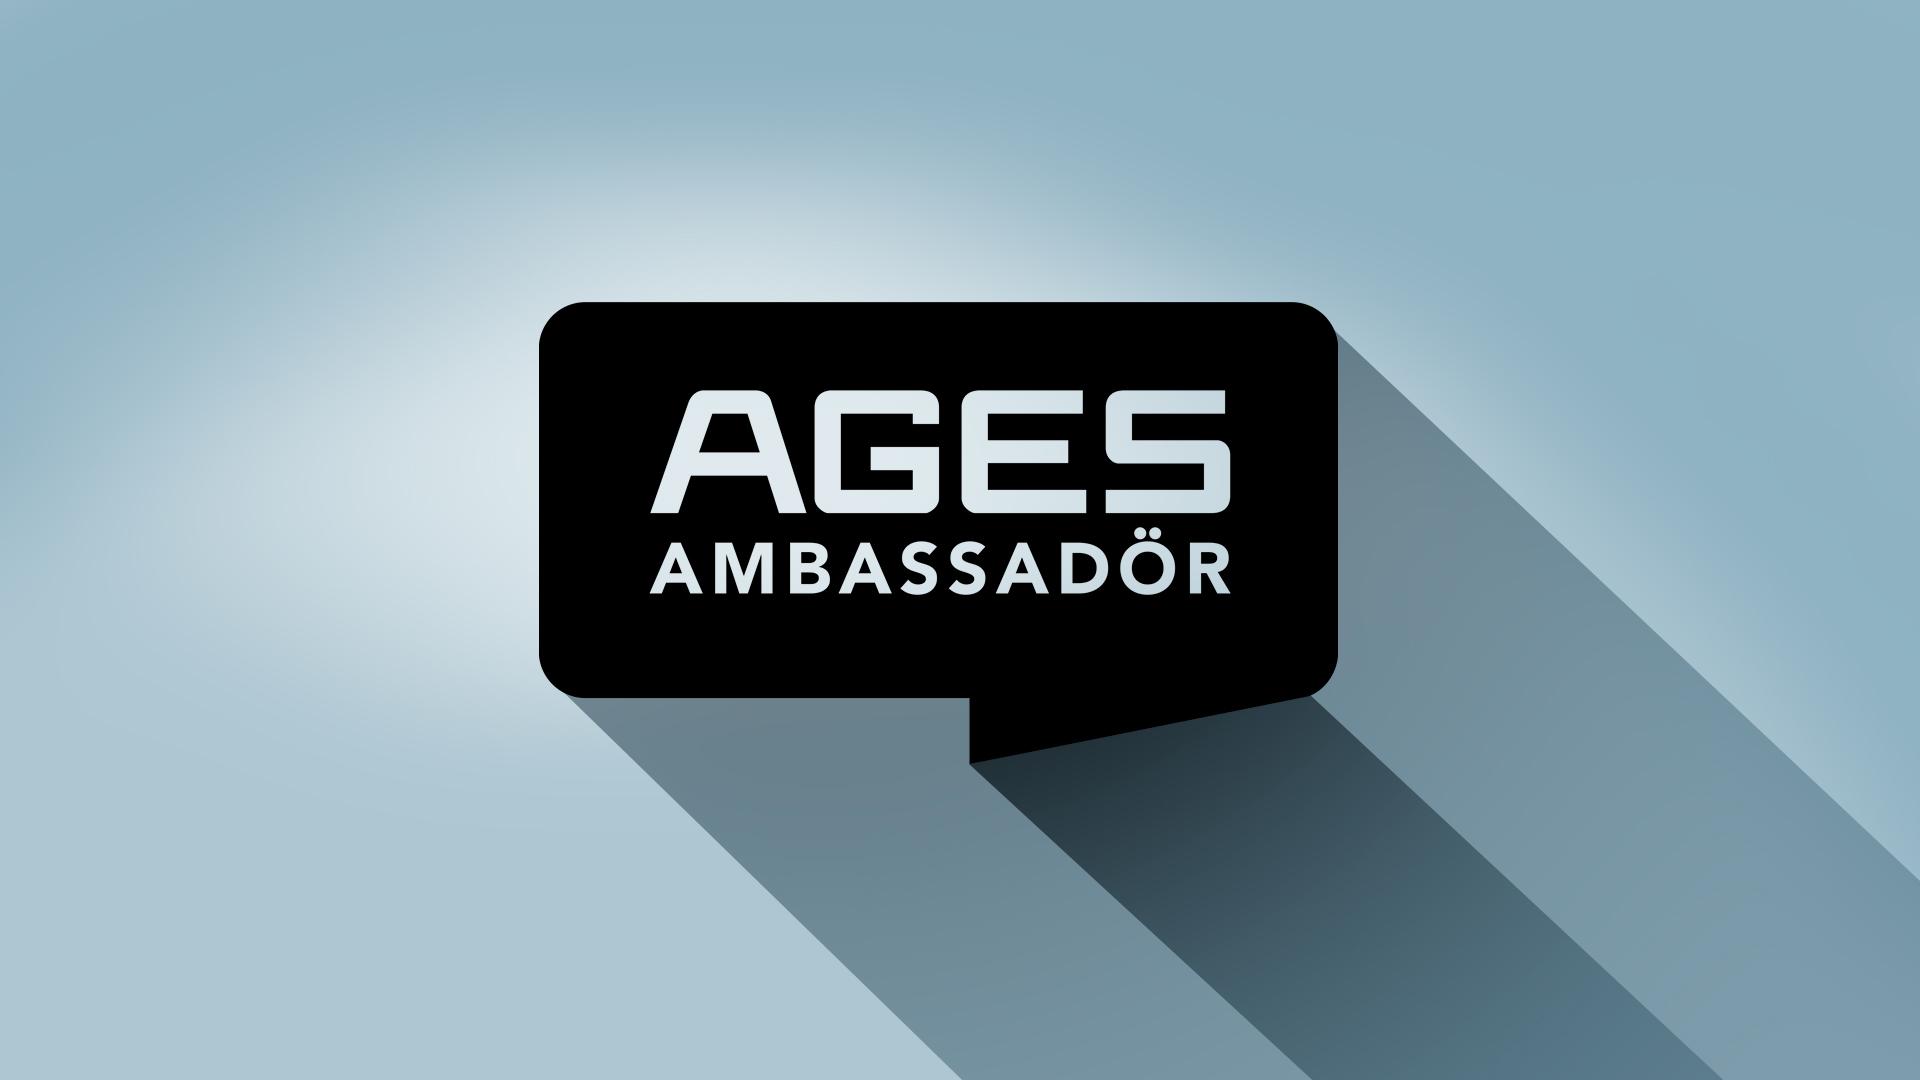 ages_ambassador_nyhet_1920x1080.jpg